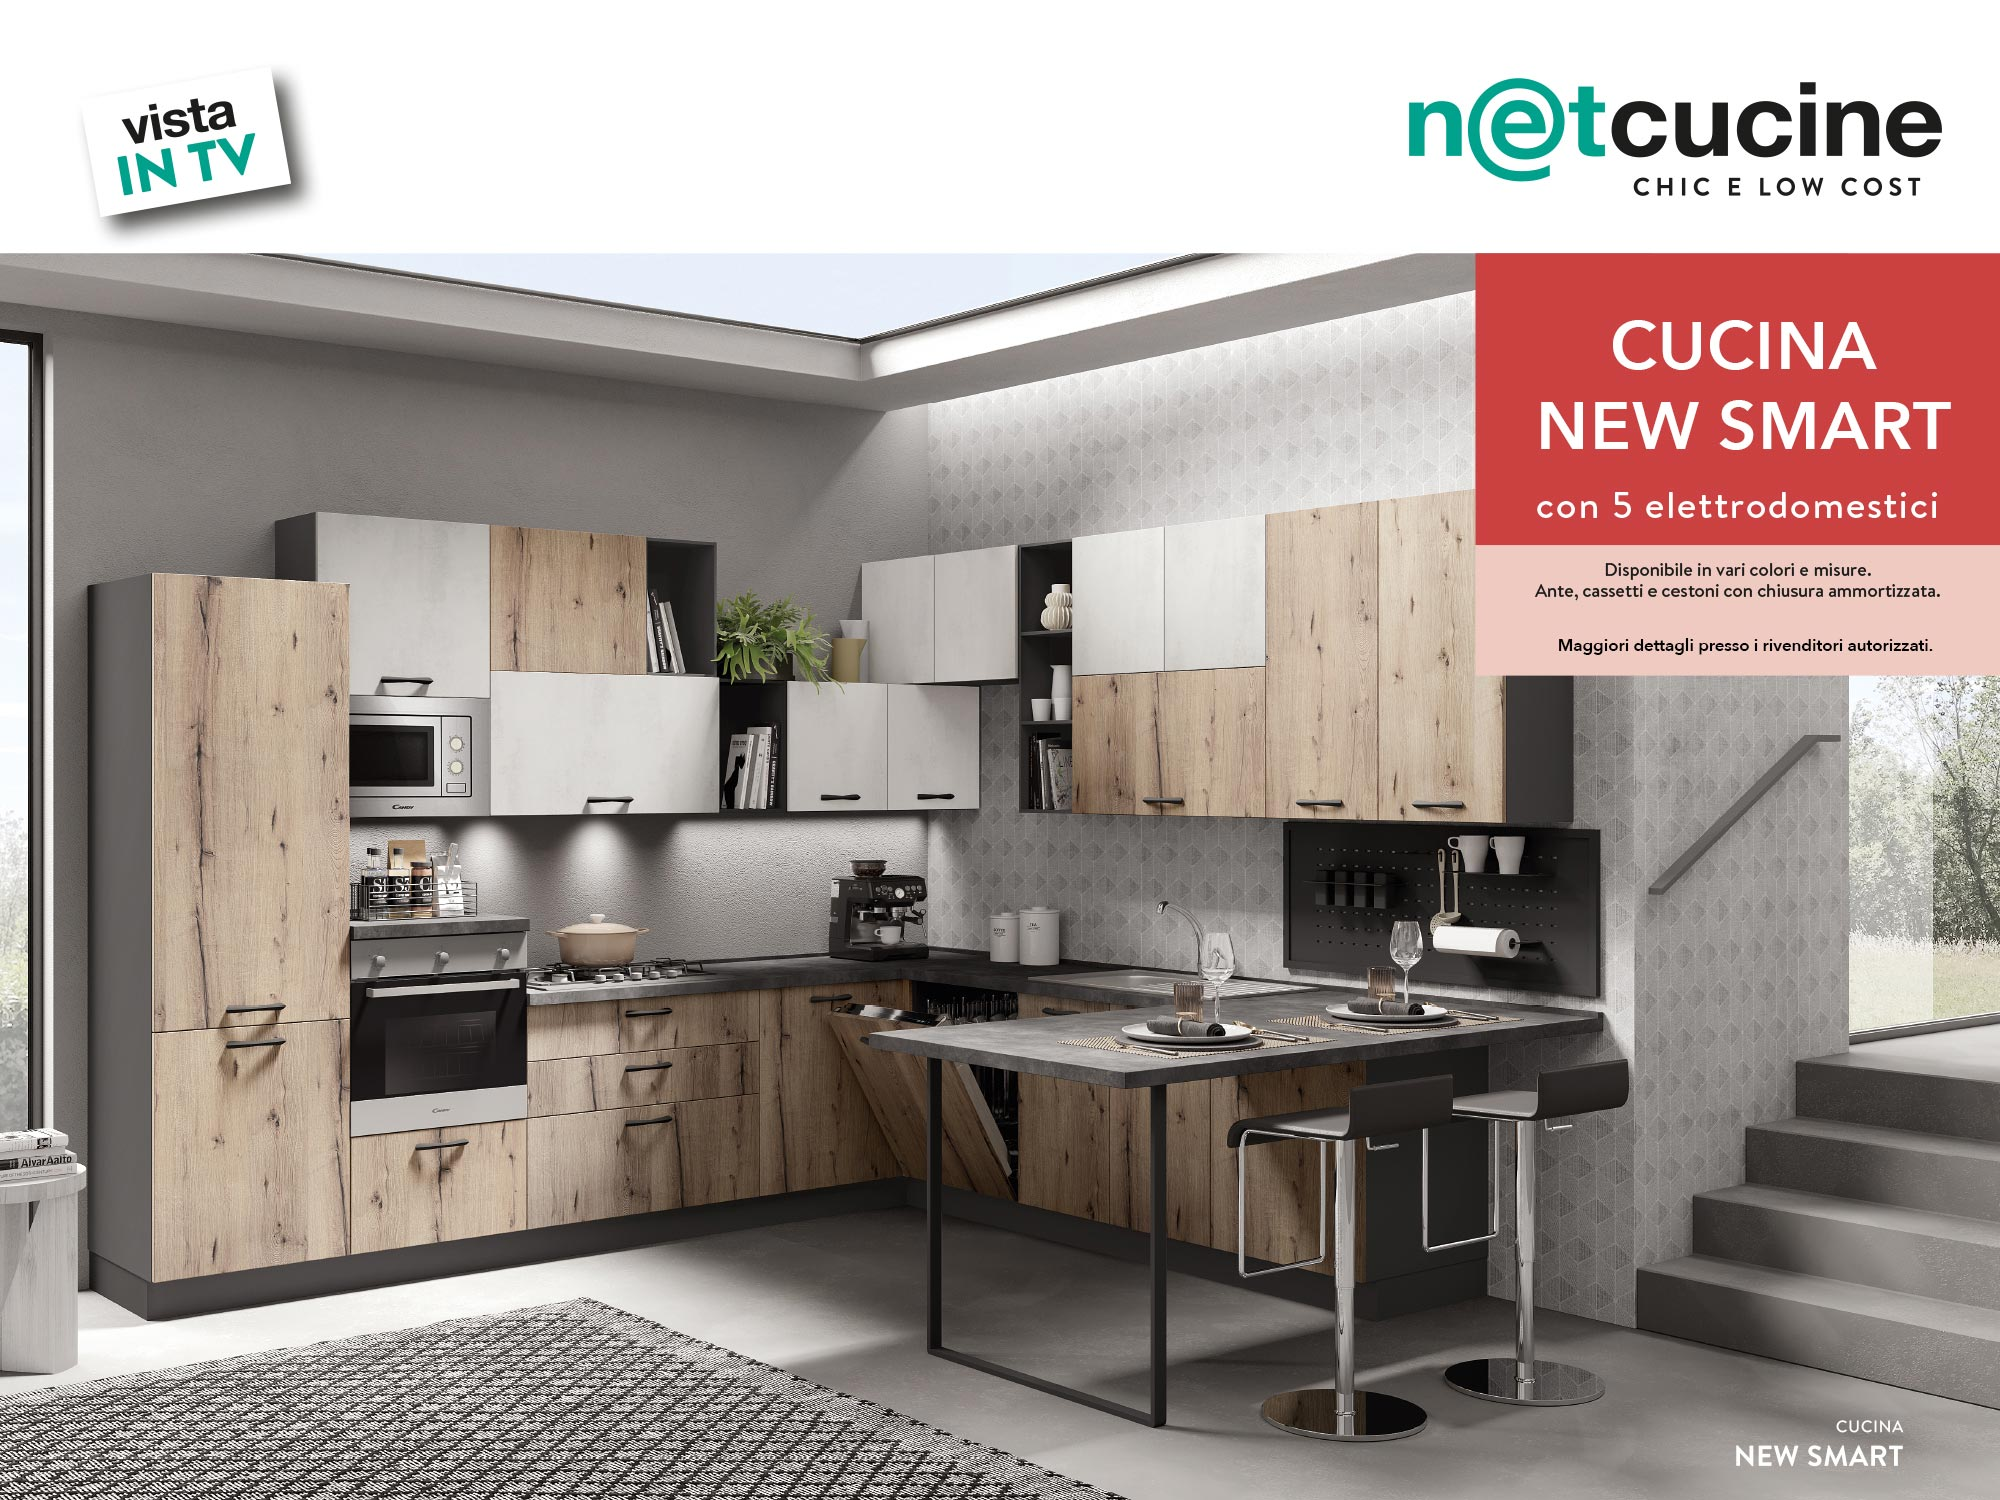 vista in TV - Cucina New smart